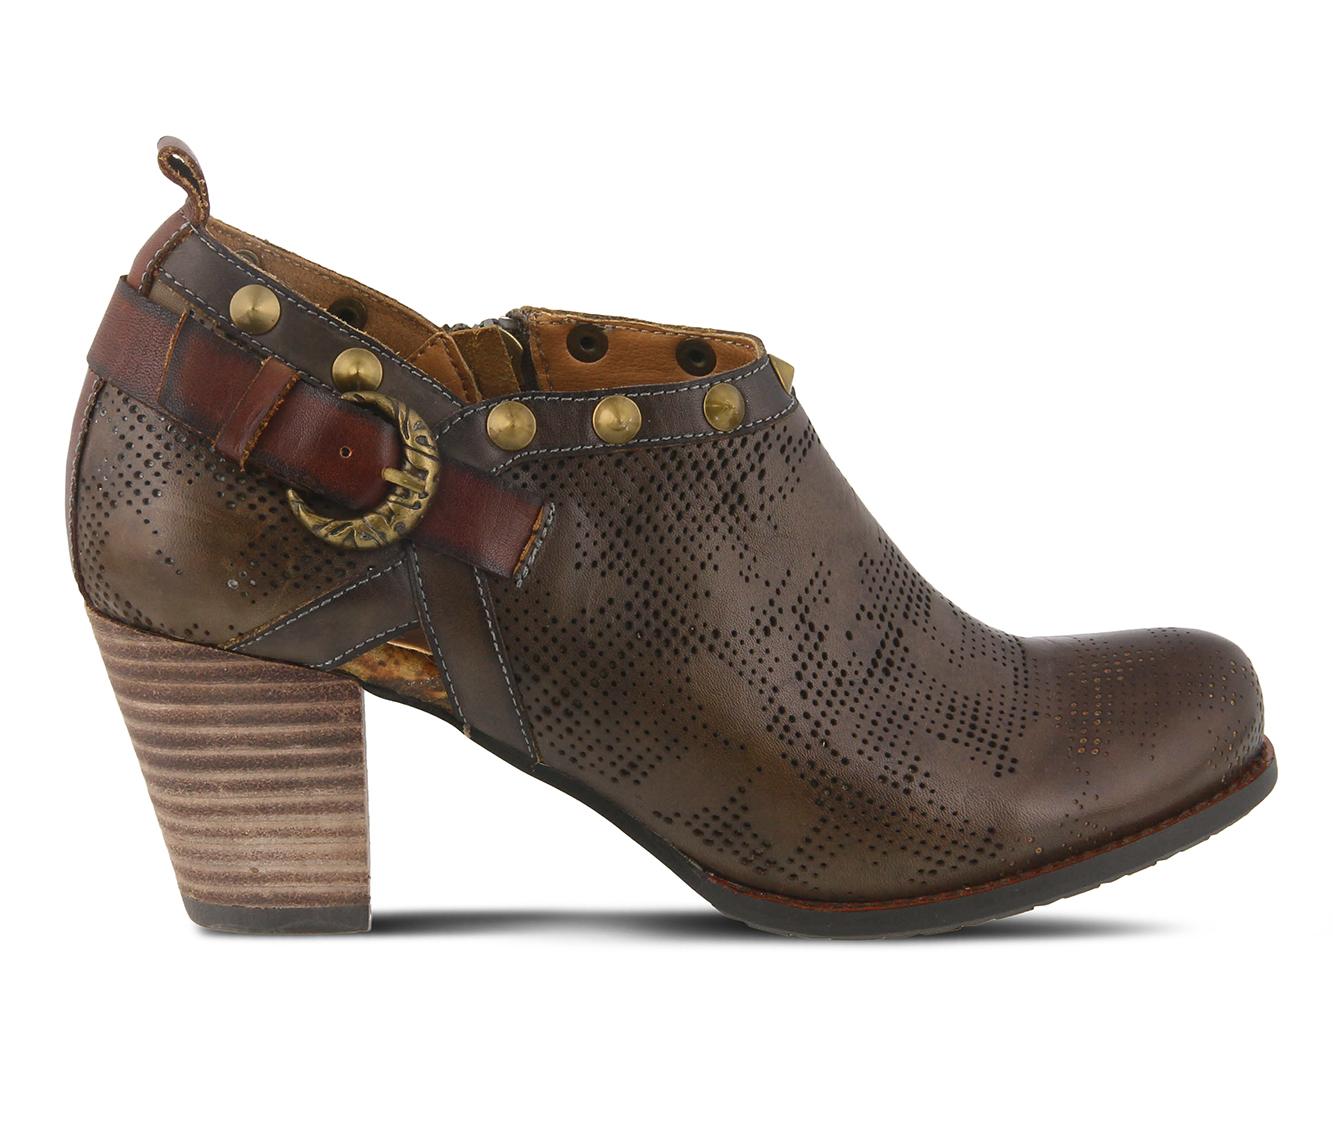 L'Artiste Kacie Women's Dress Shoe (Brown Leather)